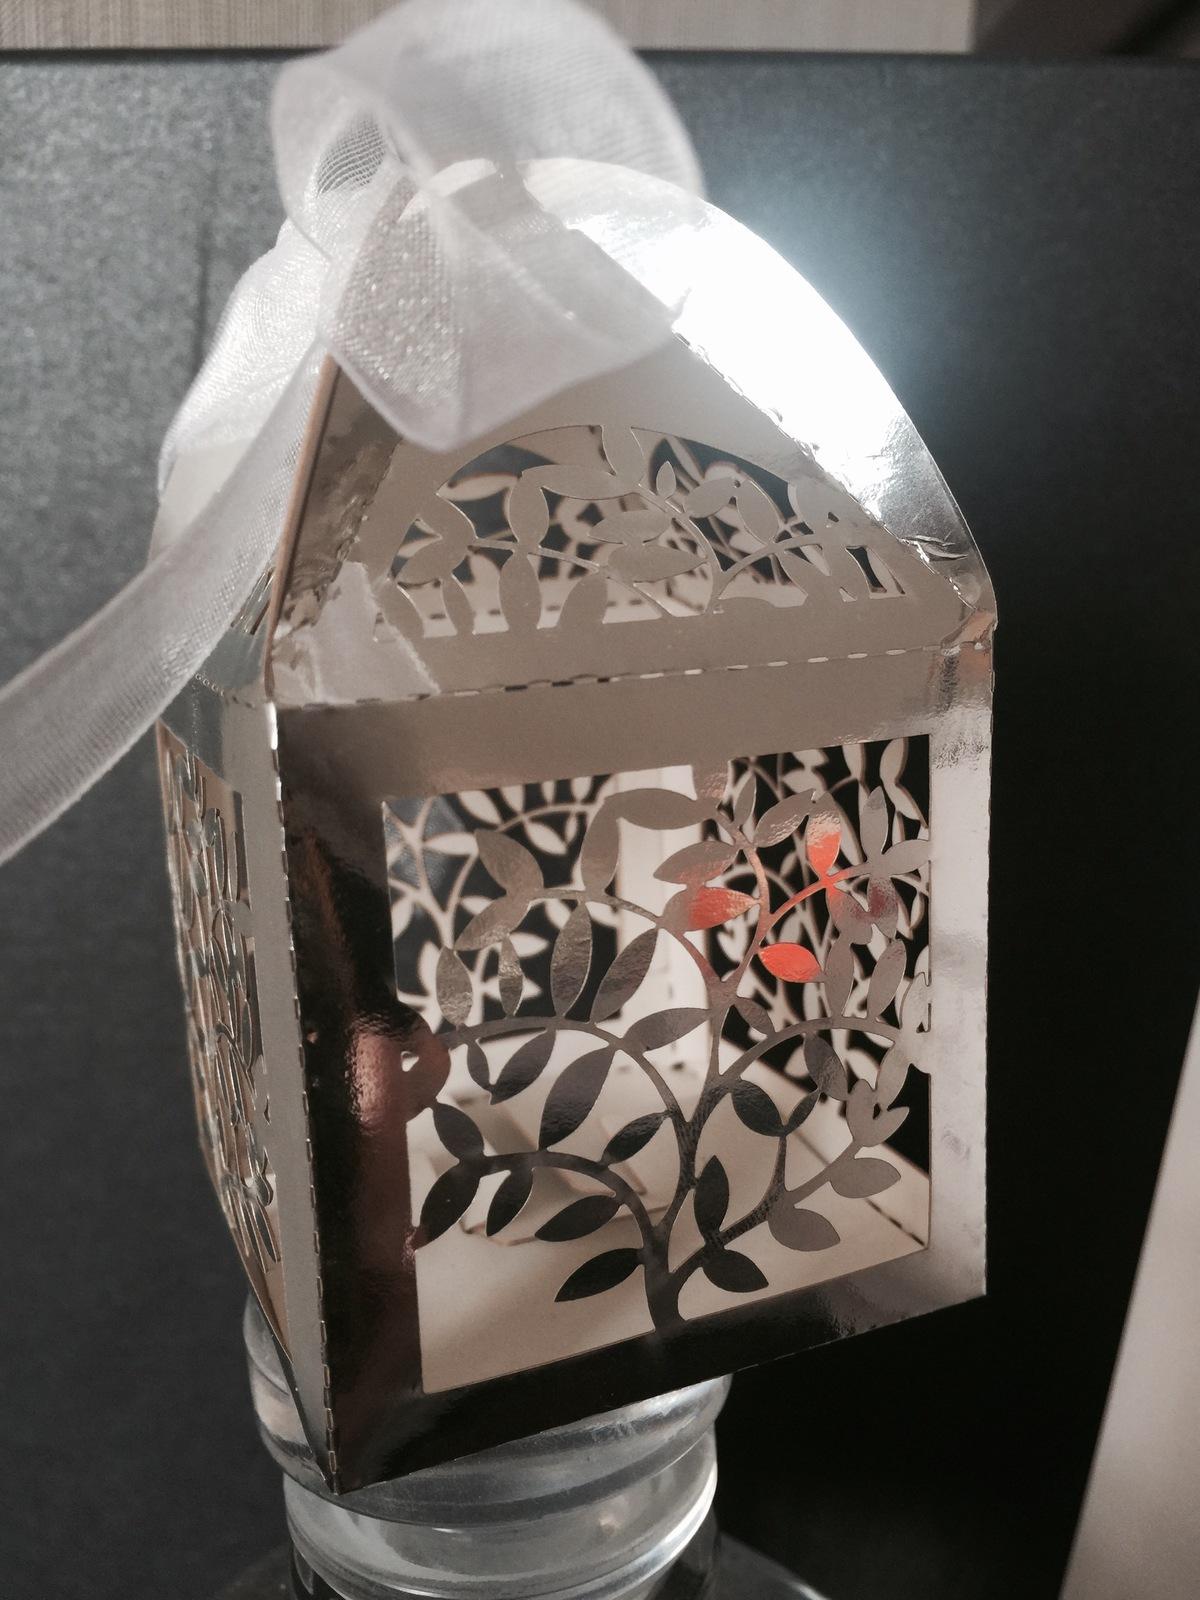 100pcs Metallic Silver Leaf Wedding Favor Boxes,Candy Boxes,laser cut Gift Boxes